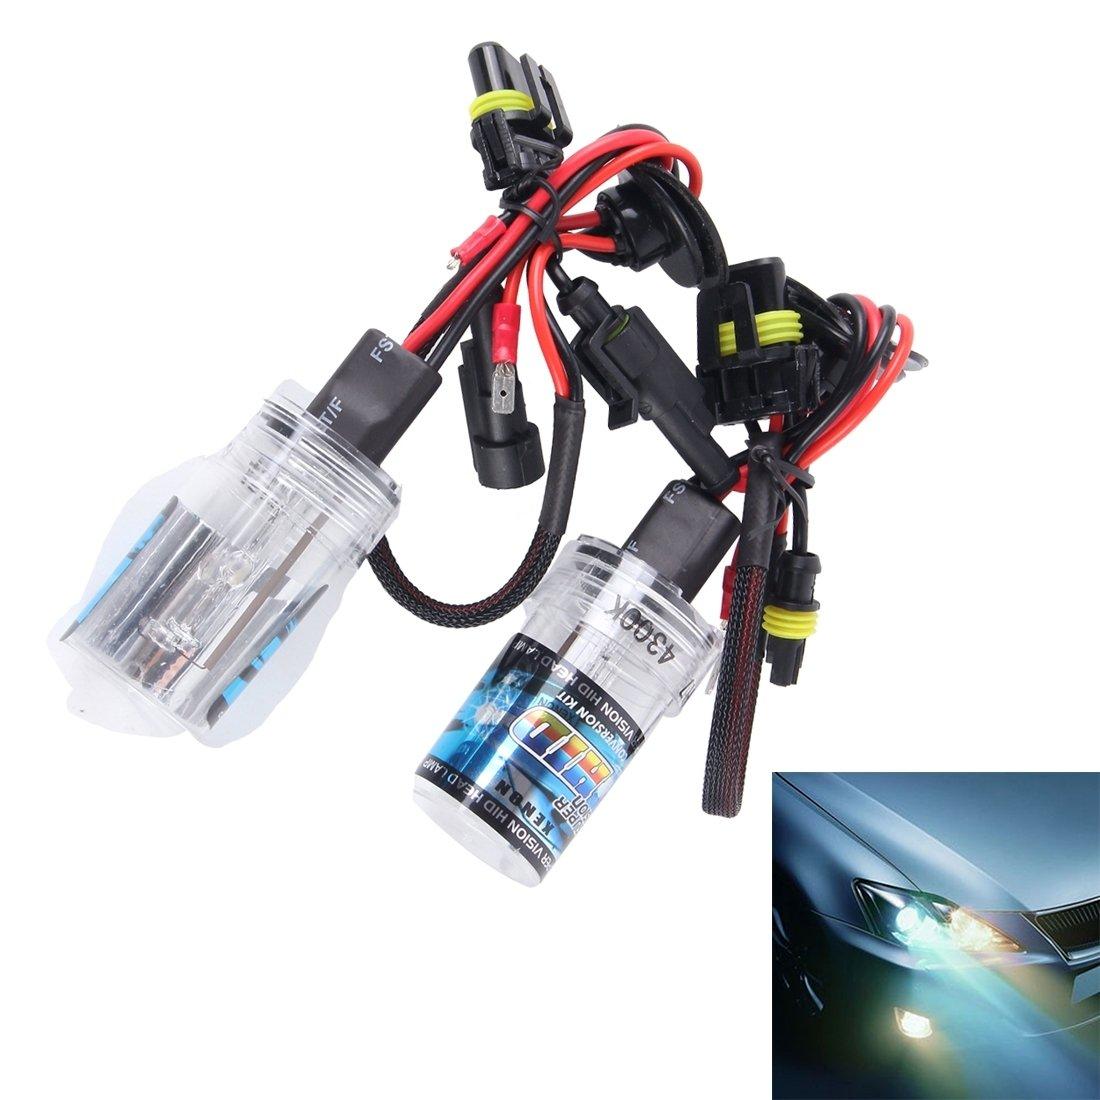 High quality lights, 2PCS DC12V 35W H7 HID Xenon Light Single Beam Super Vision Waterproof Head Lamp, Color Temperature: 4300K